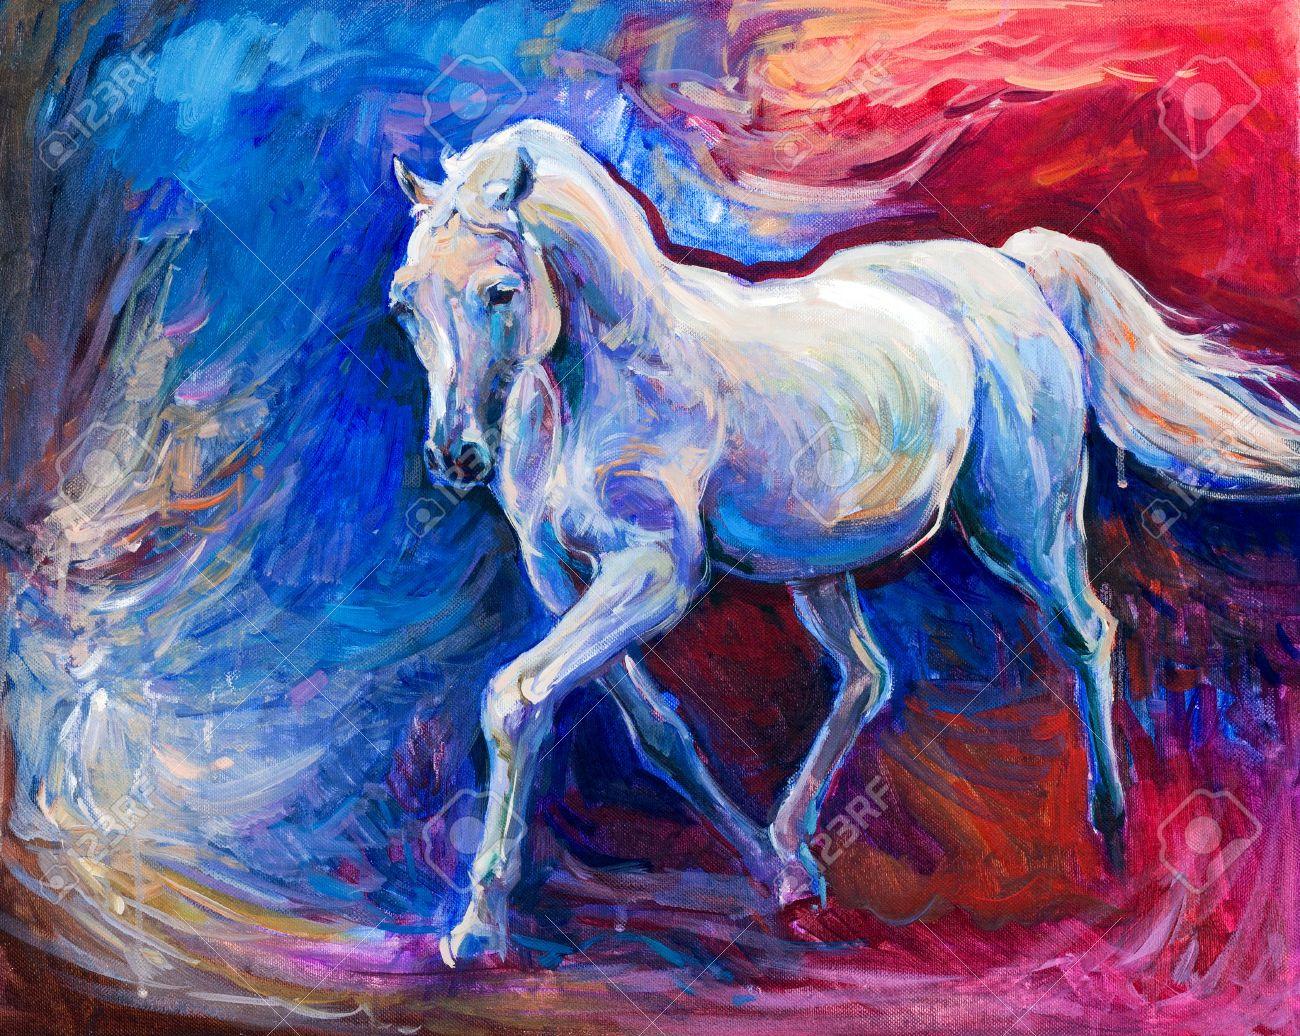 horse painting modern fine art - Google Search